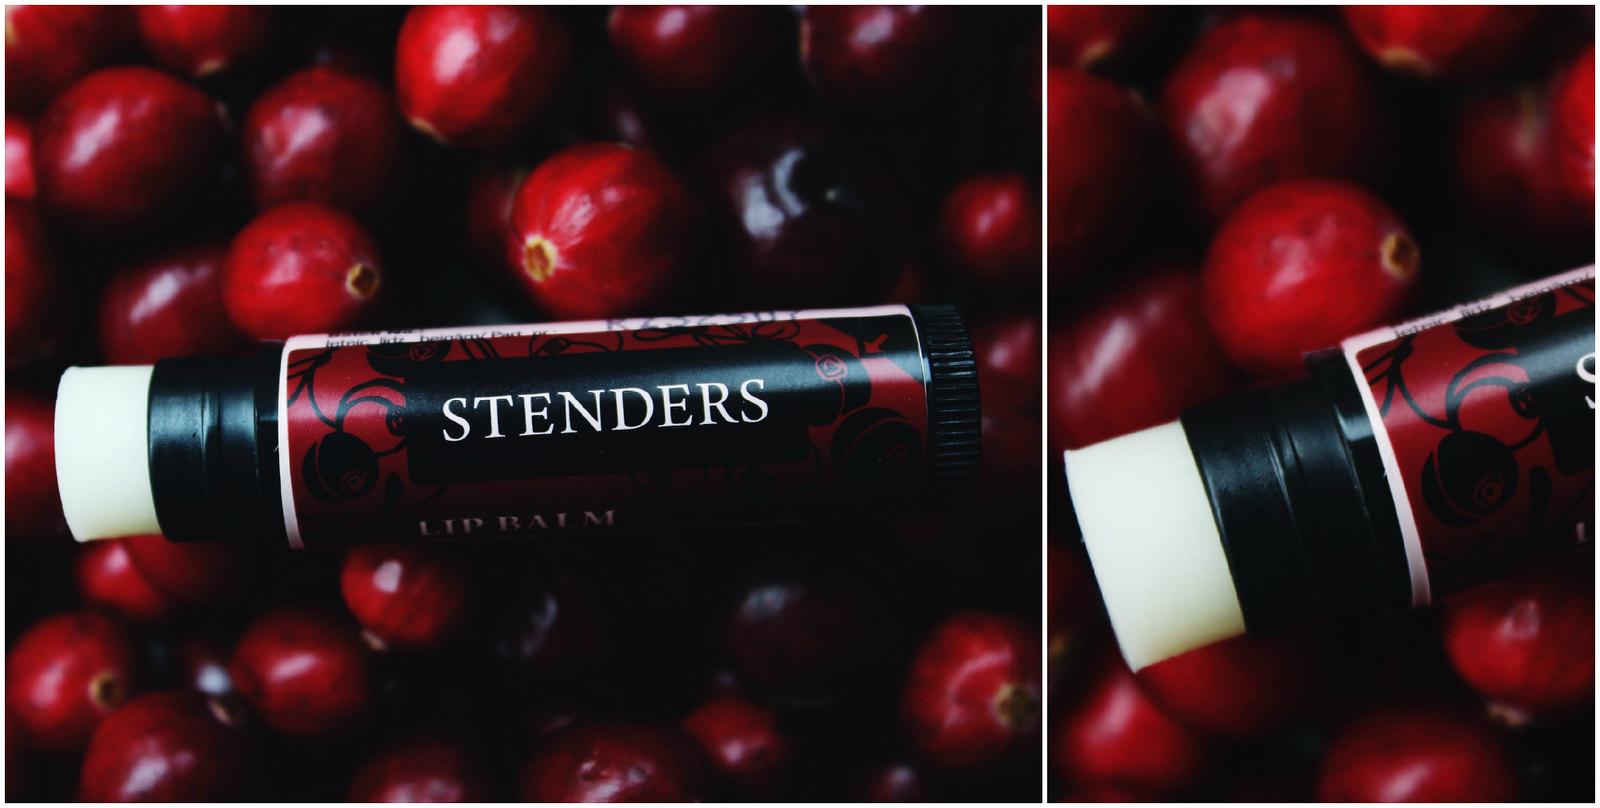 Stenders lūpu balzāms atsauksme